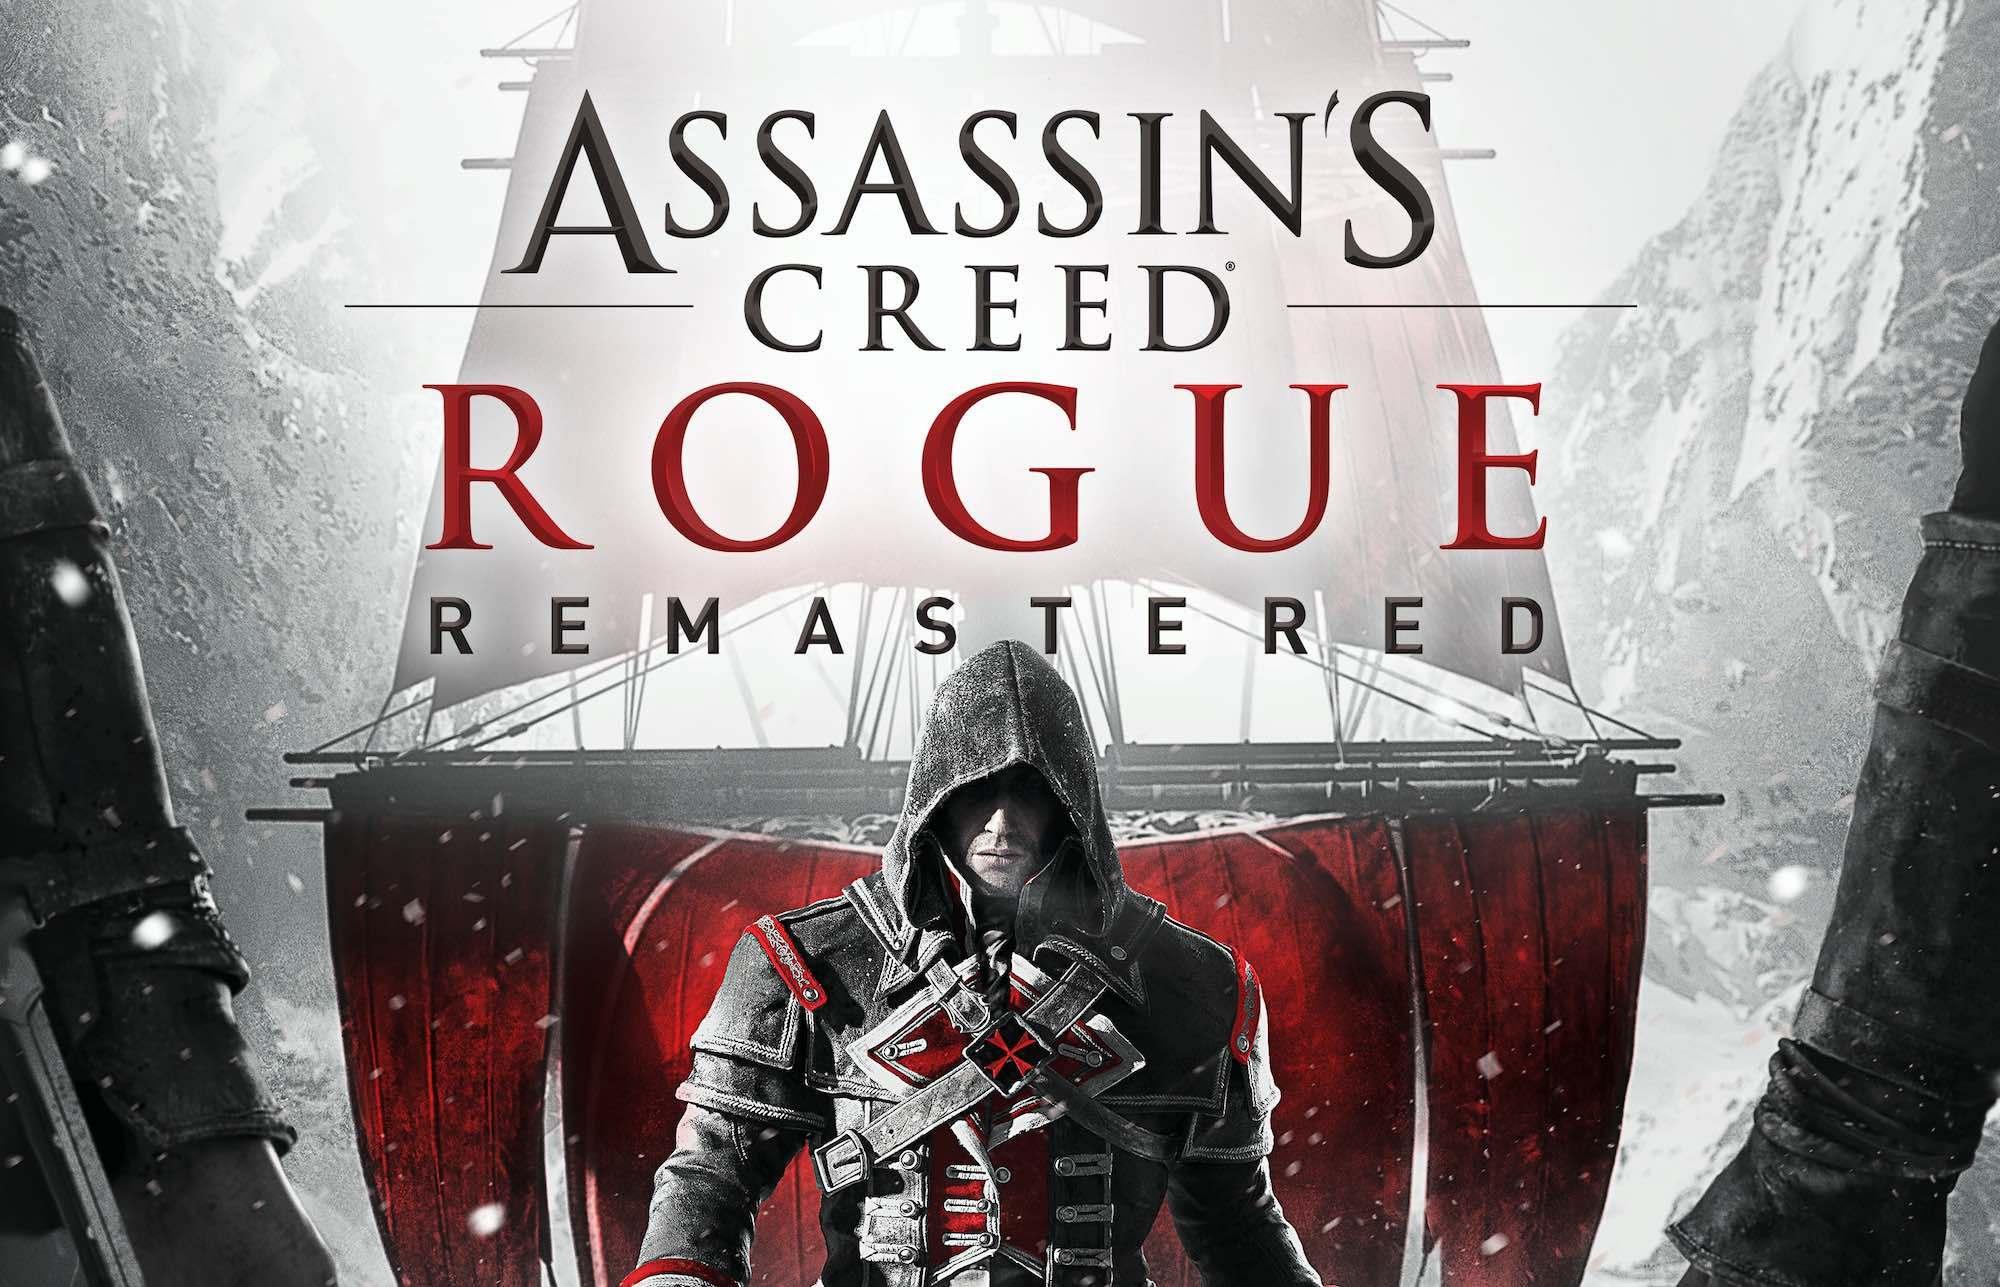 Assassin's Creed Rogue Remastered anunciado